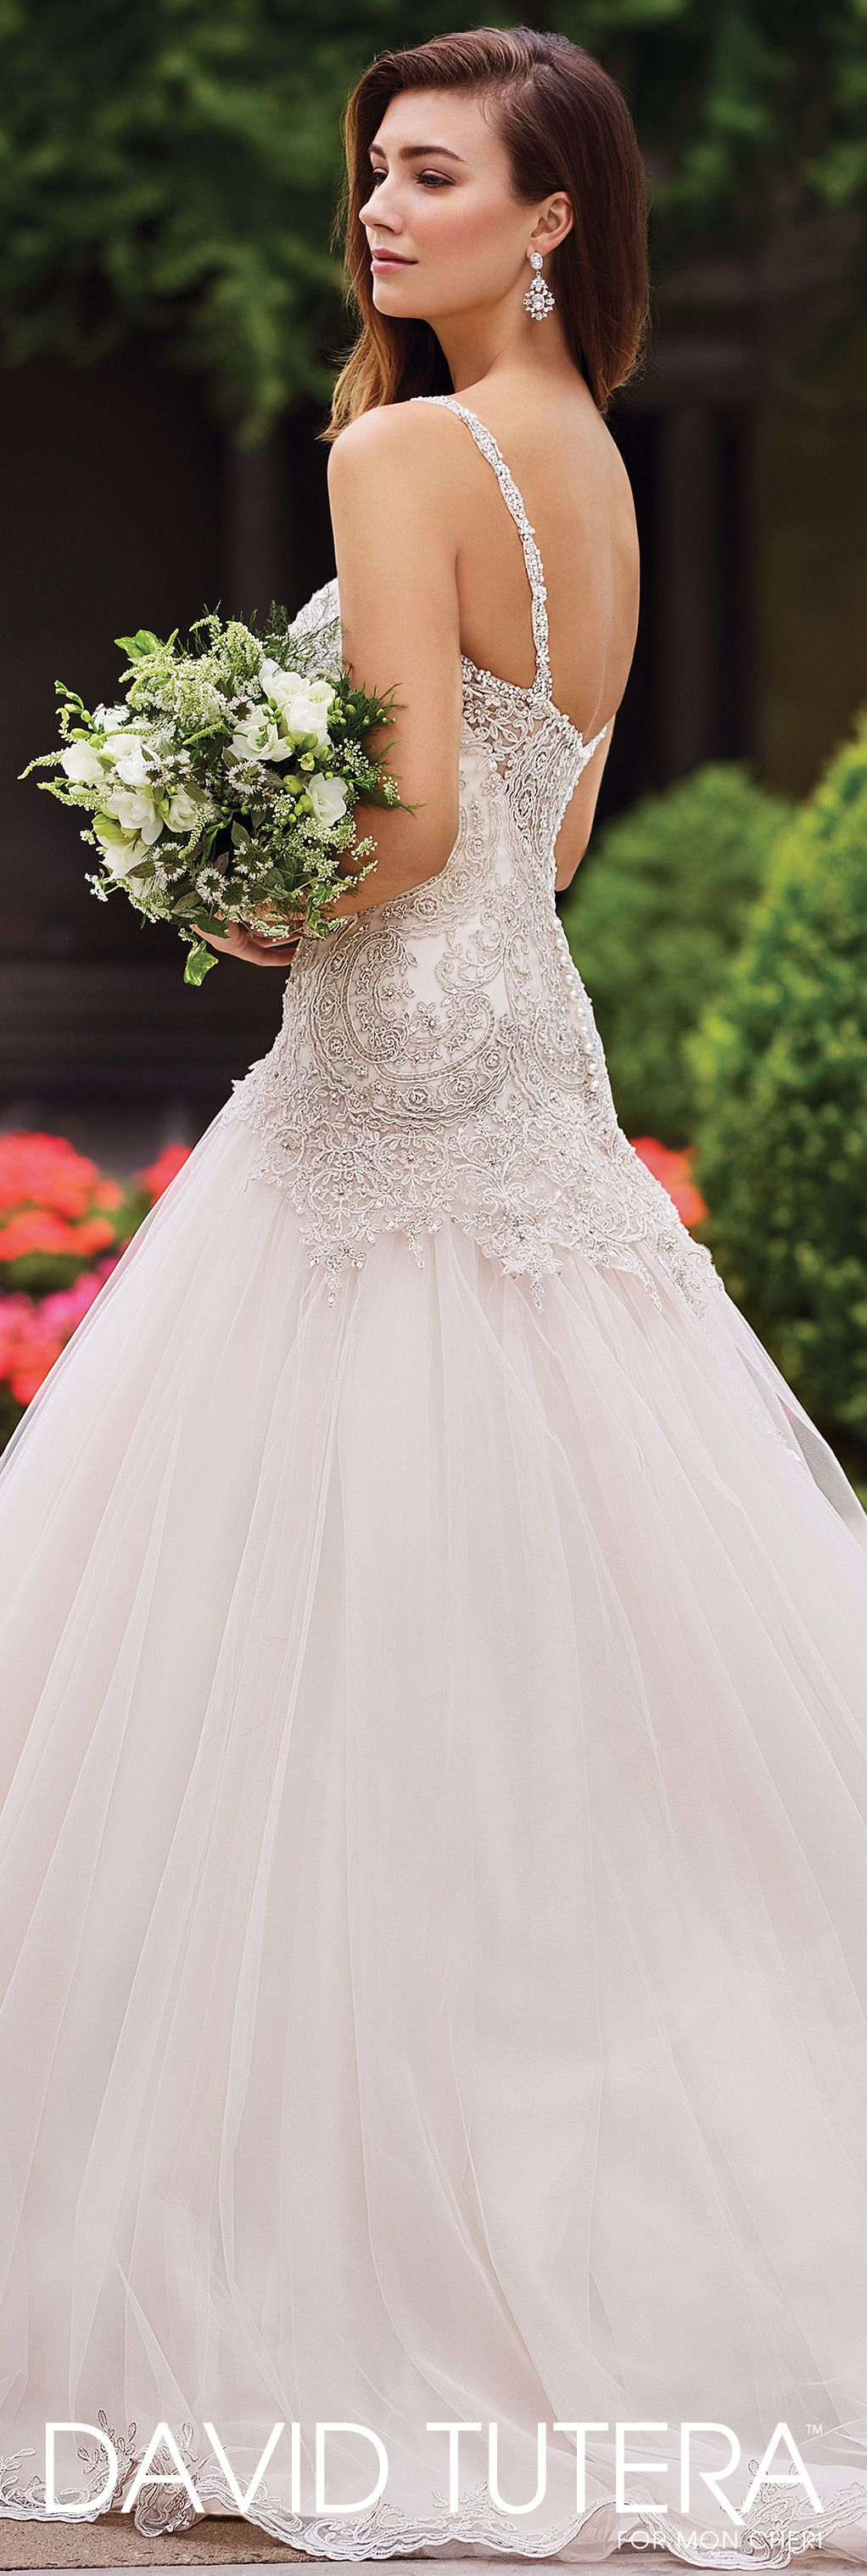 Metallic lace u tulle aline wedding dress carmelina david